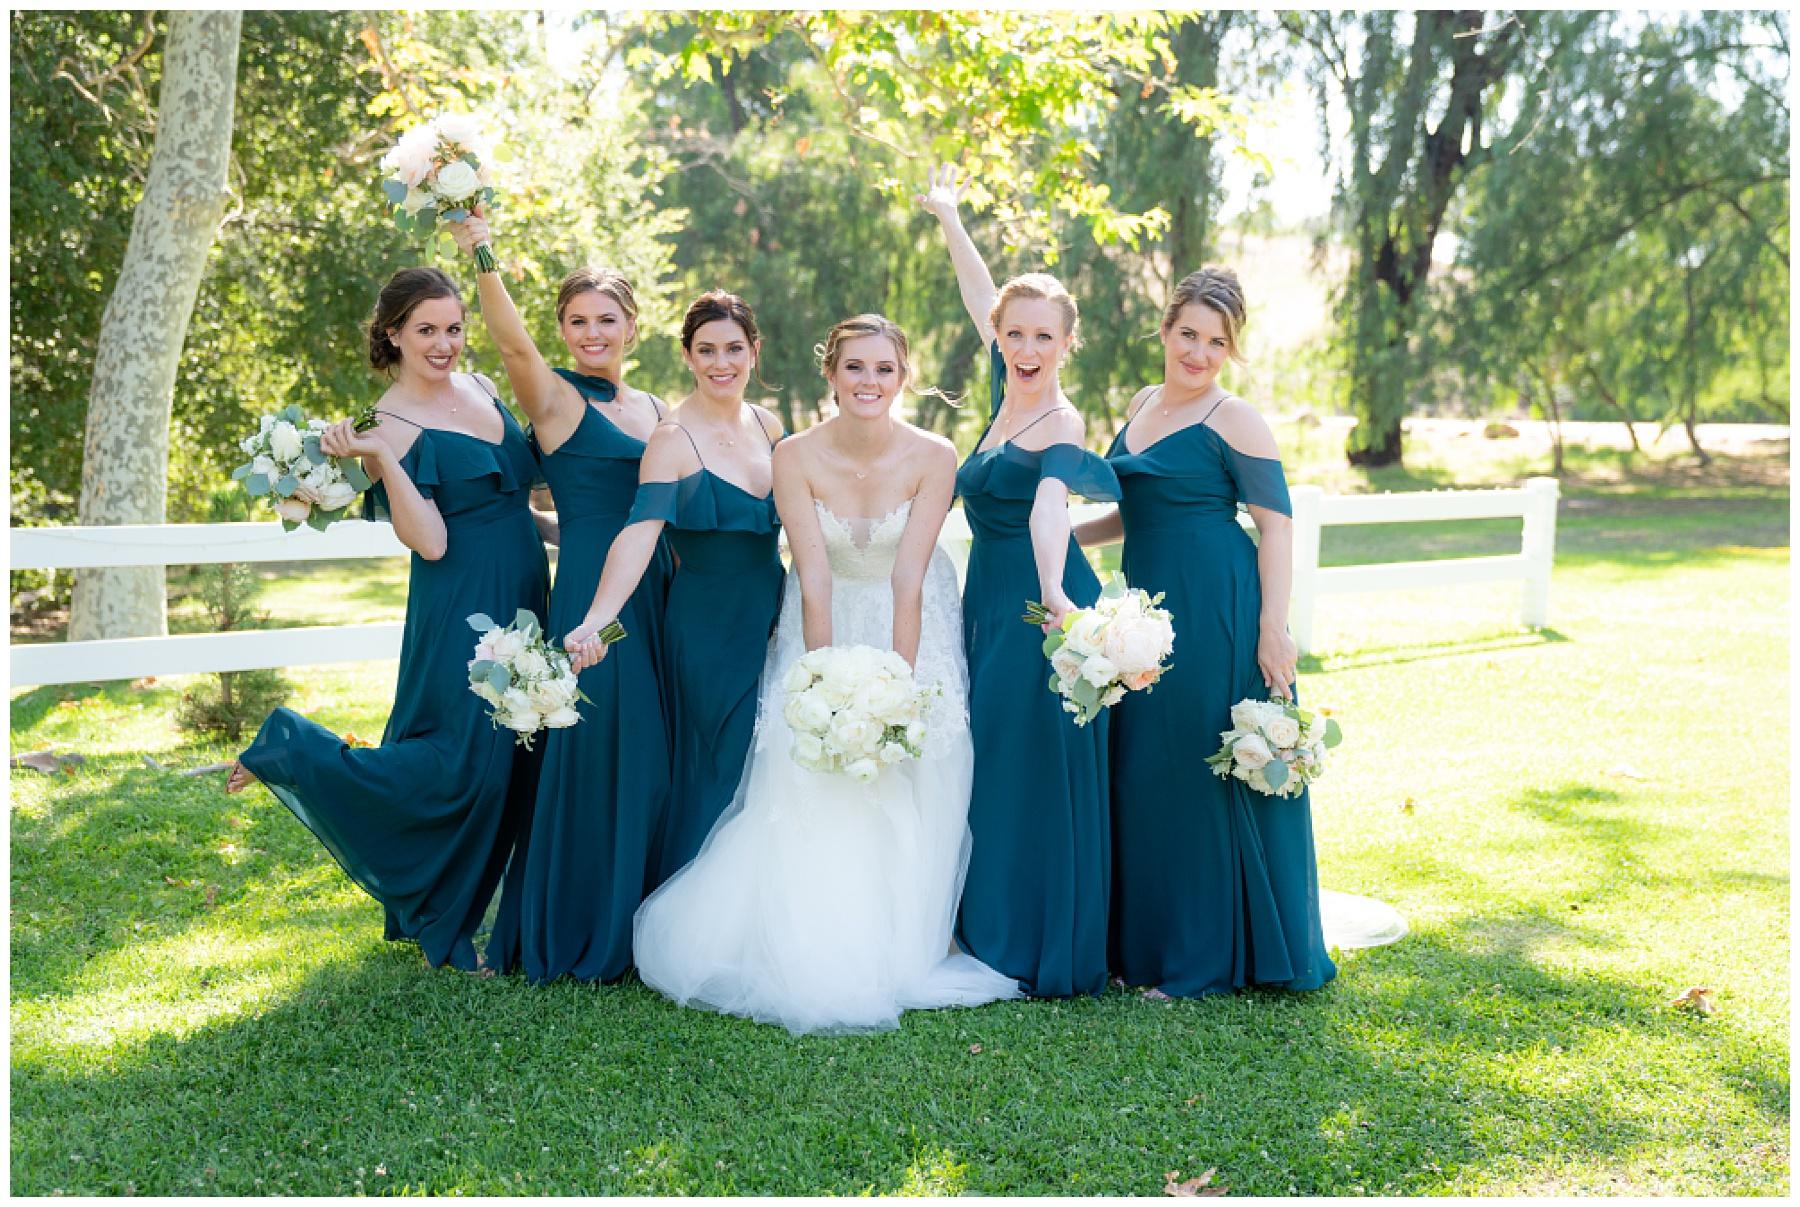 fun bridal party photo teal dress